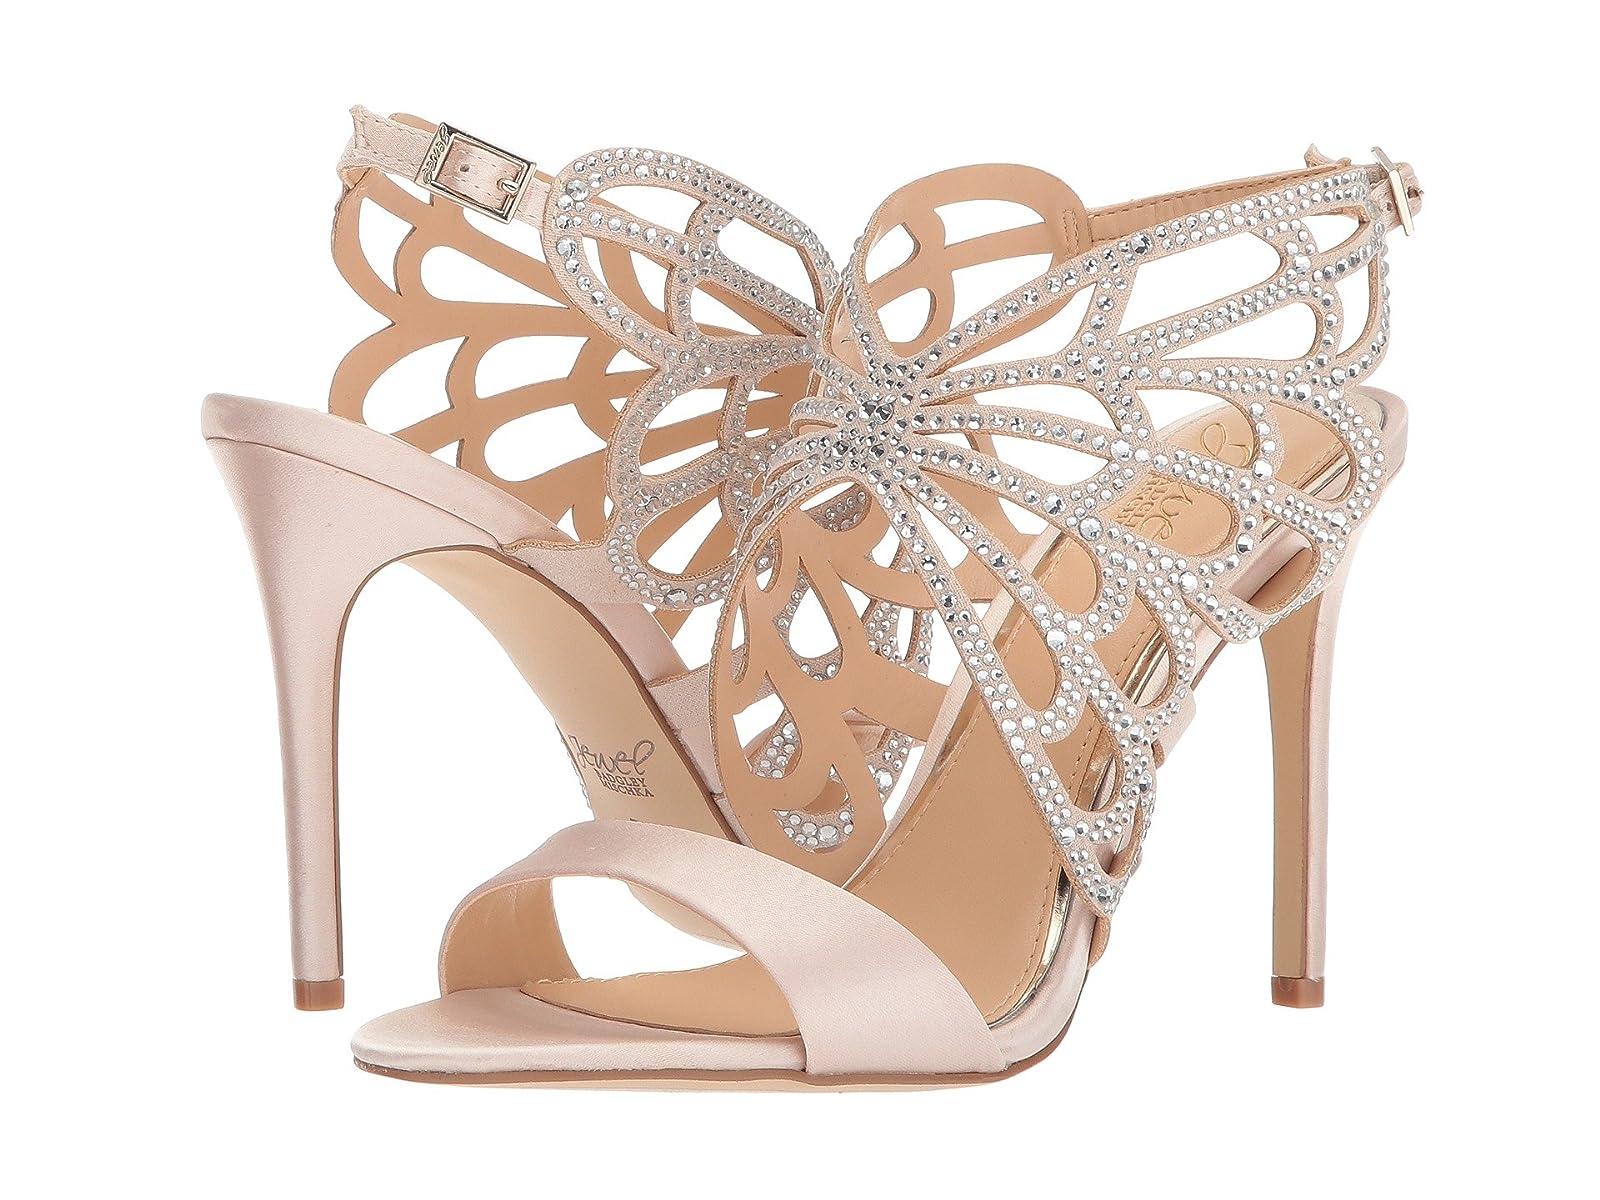 Jewel Badgley Mischka TaresaCheap and distinctive eye-catching shoes